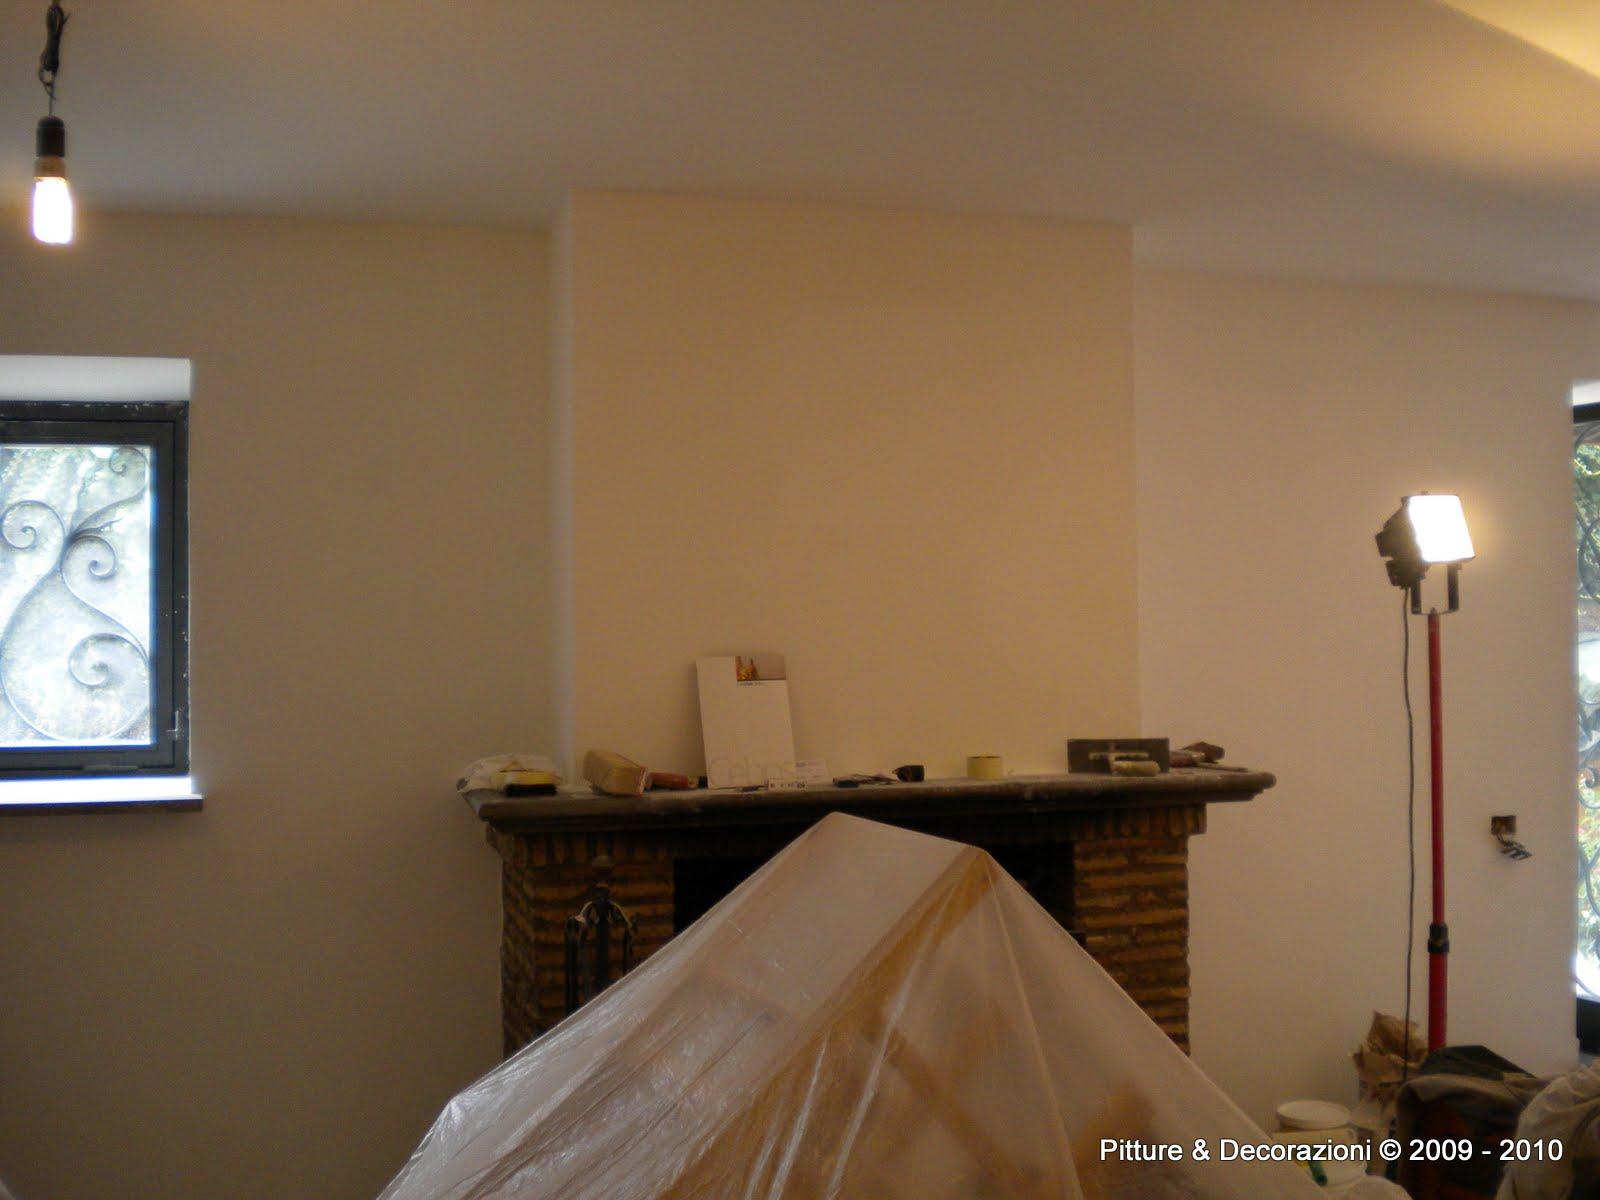 Pittura Pareti Effetto Seta : Pittura pareti interne. interesting tipi di with pittura pareti